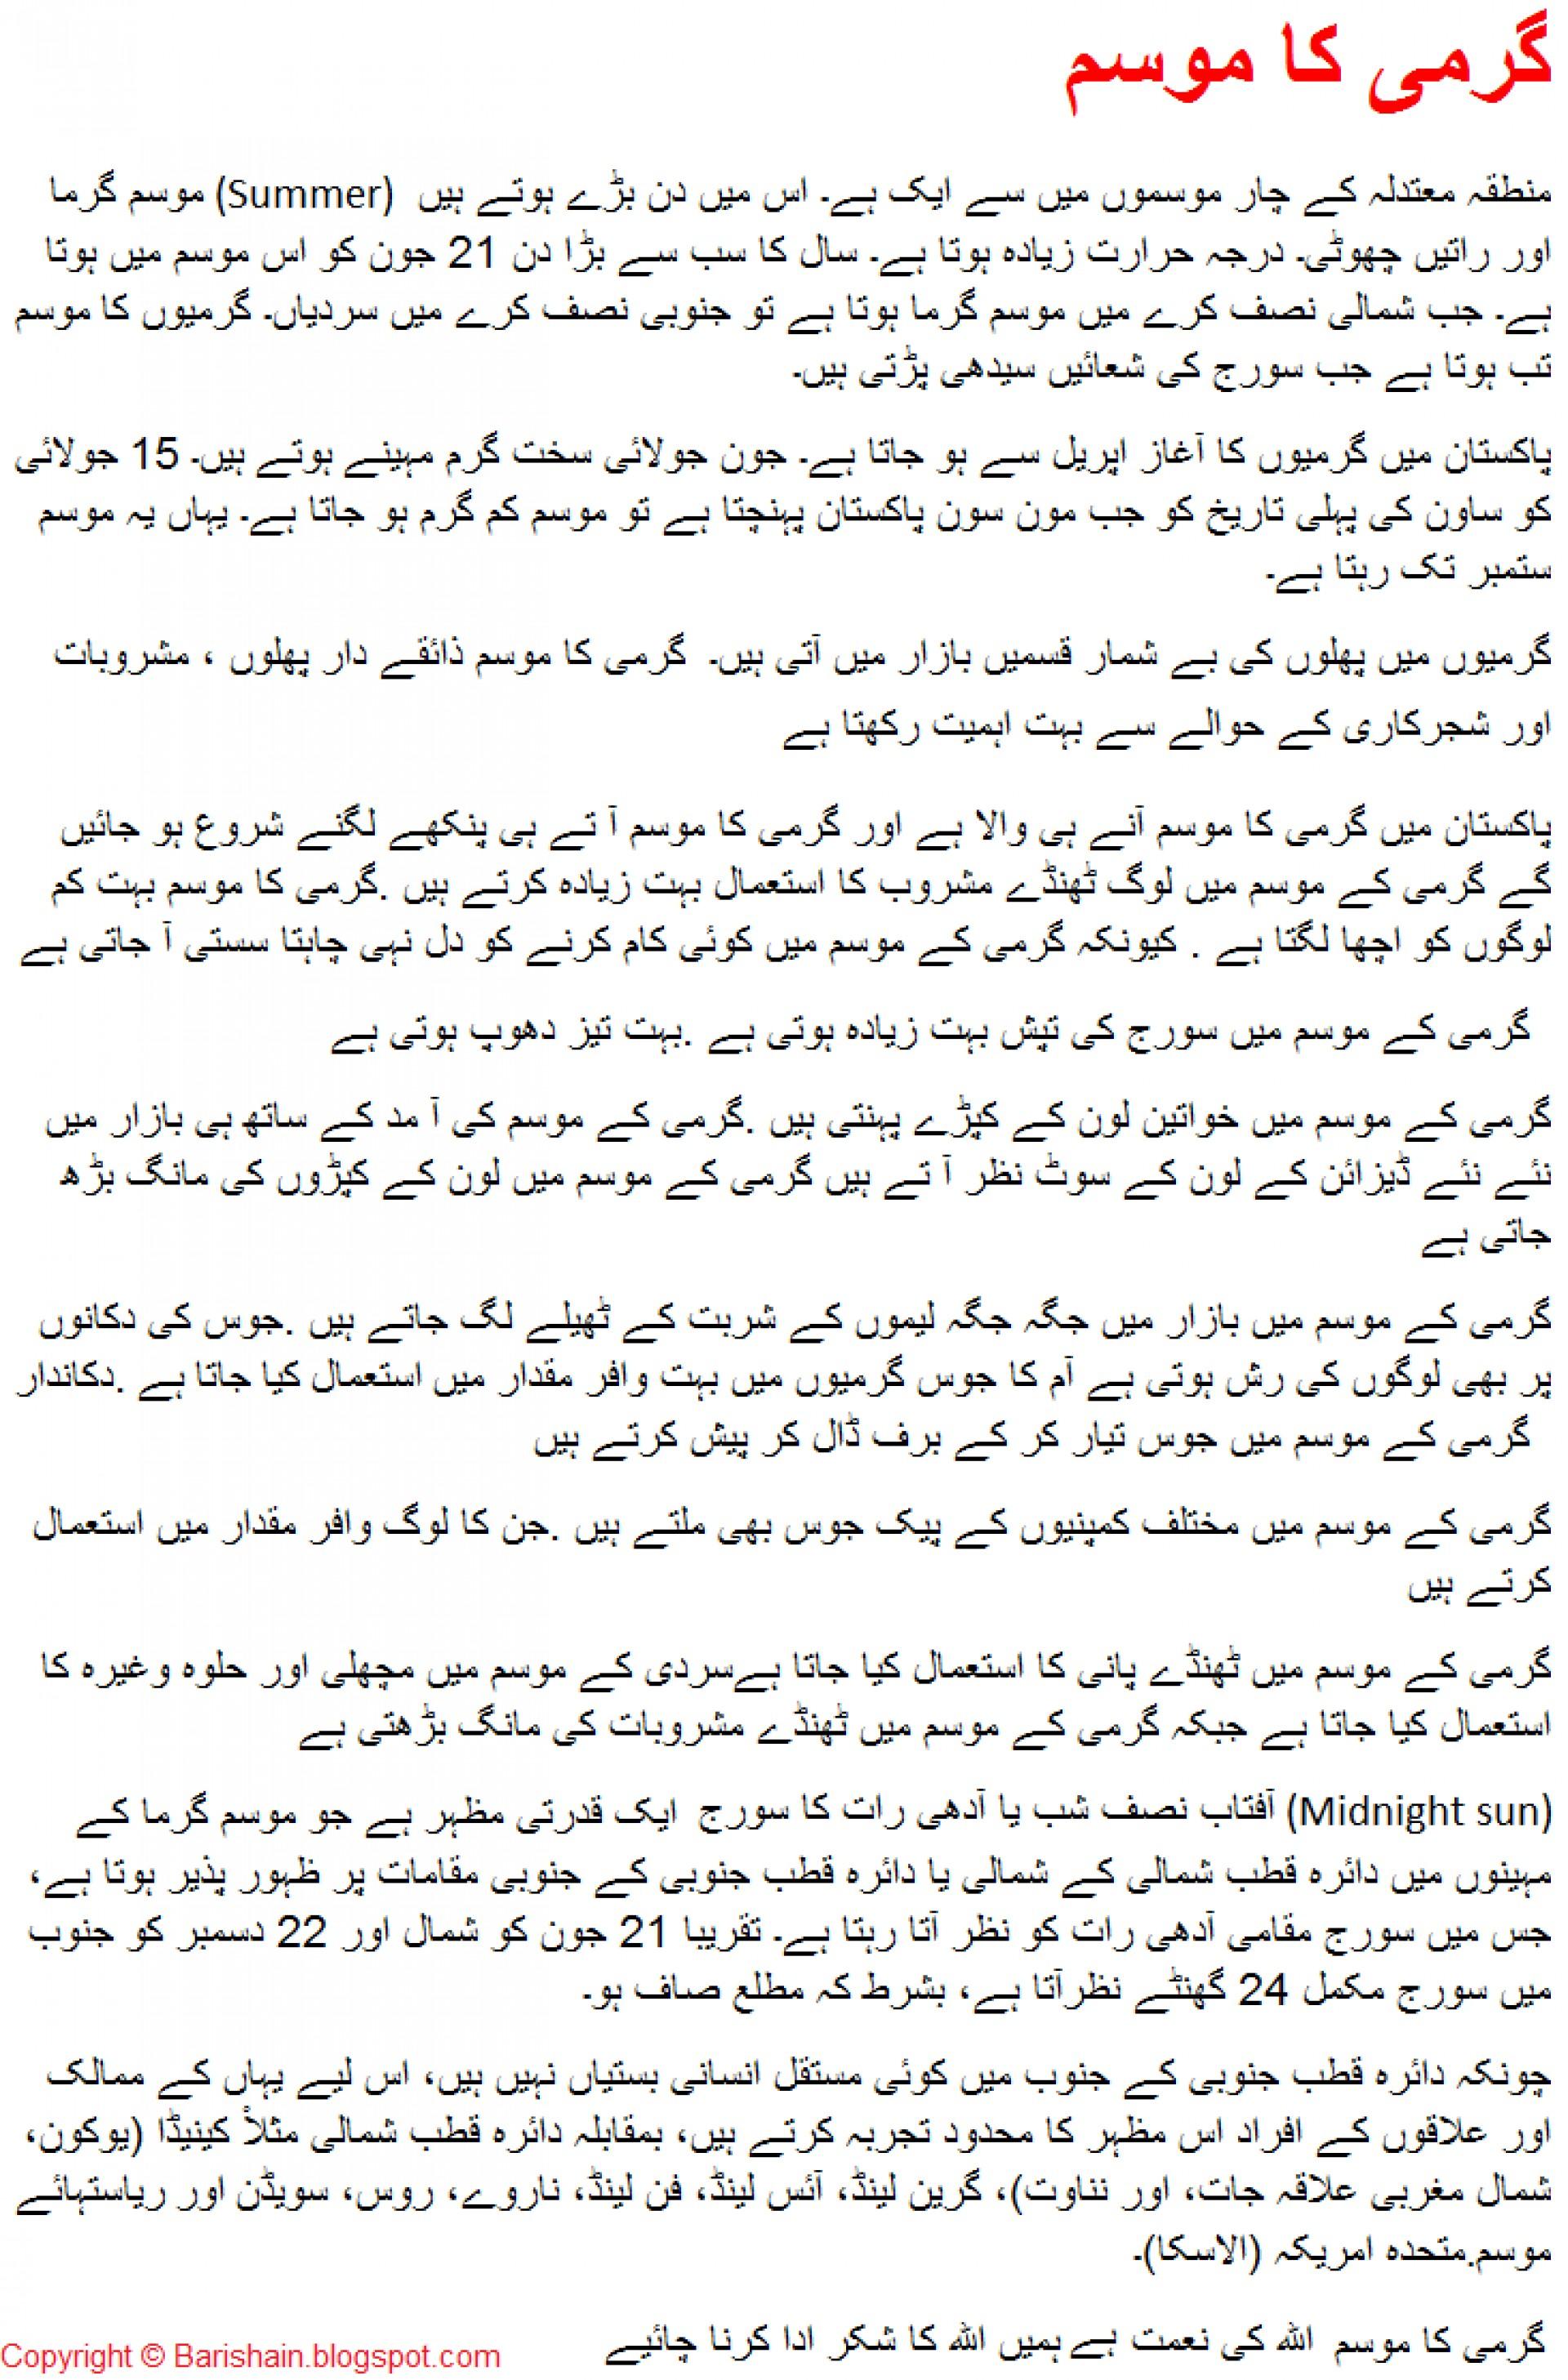 009 Summer2bseason2bin2burdu Essay Example Summer Frightening Vacation For Class 6 In Urdu On Marathi 1920